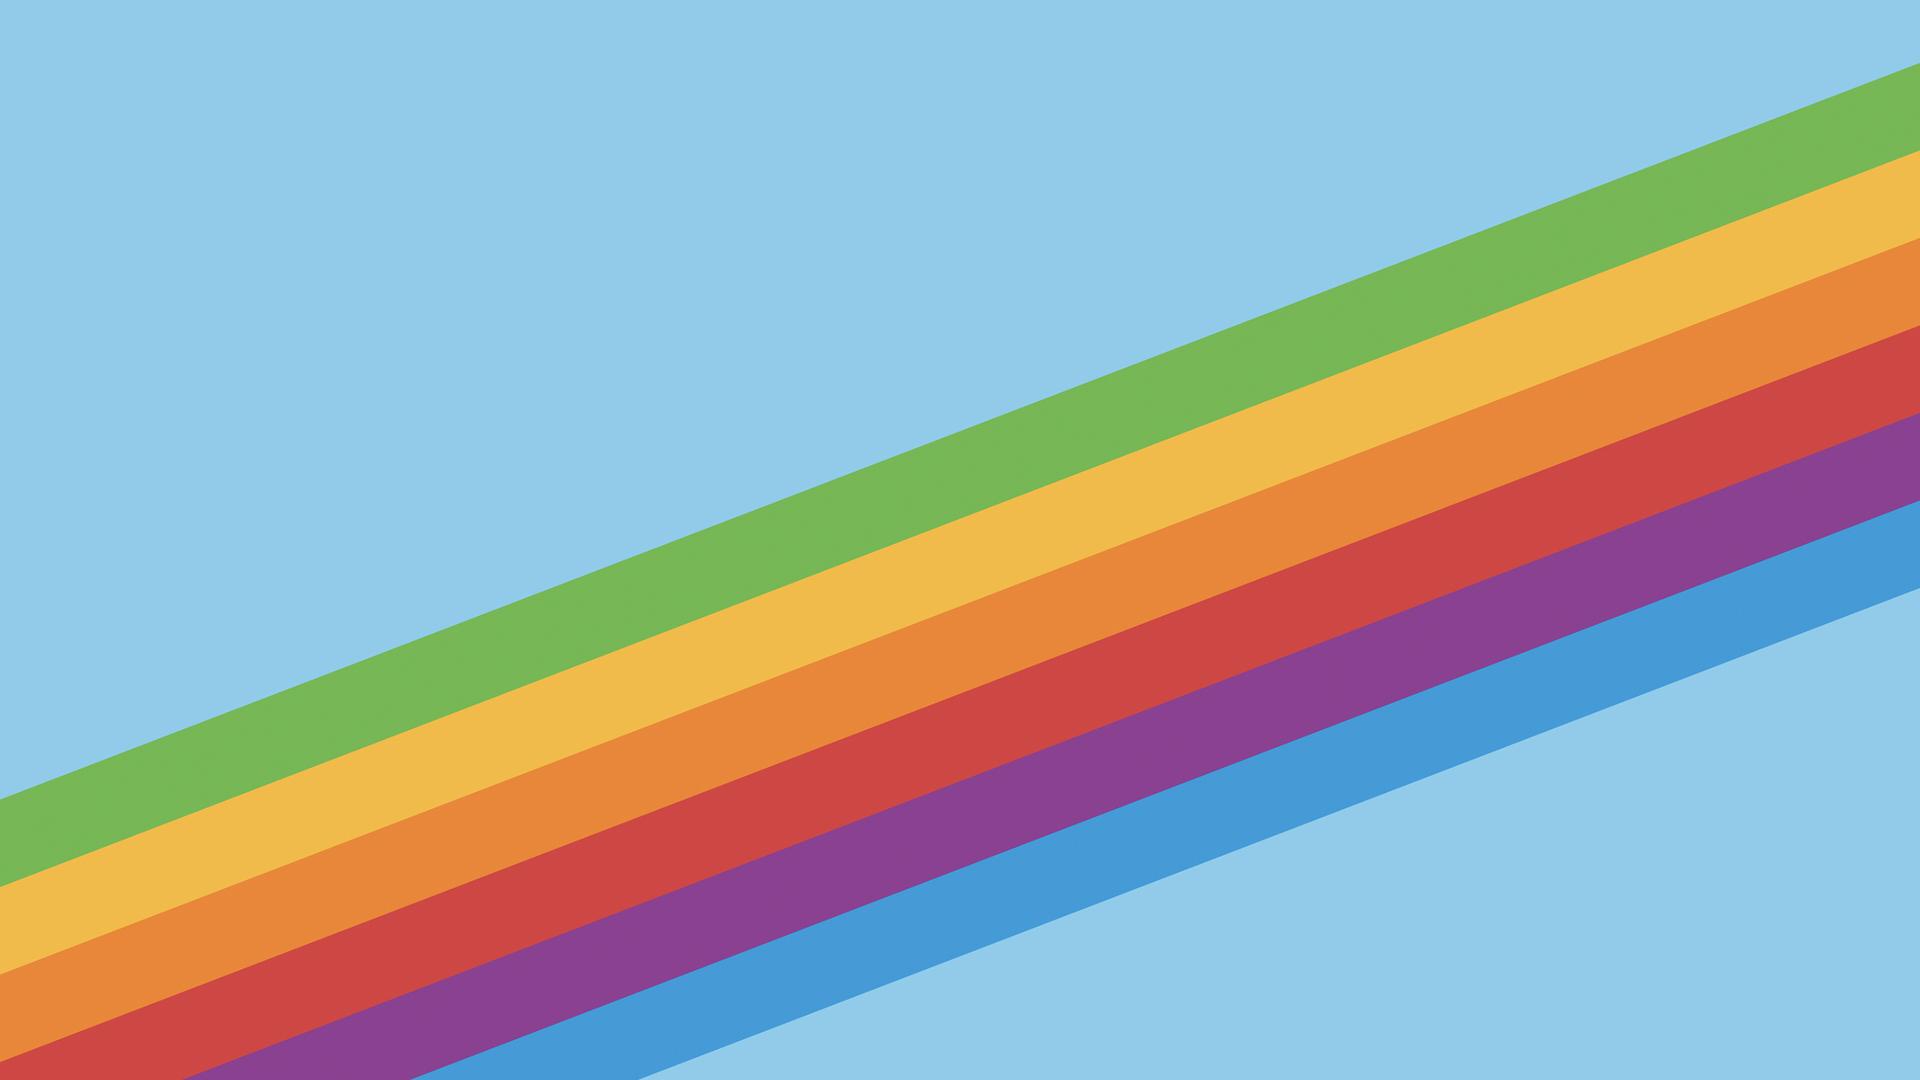 Heritage Rainbow Stripe Iphone X Iphone 8 Ios 11 Stock: 1920x1080 Ios 11 Heritage Stripe Blue Laptop Full HD 1080P